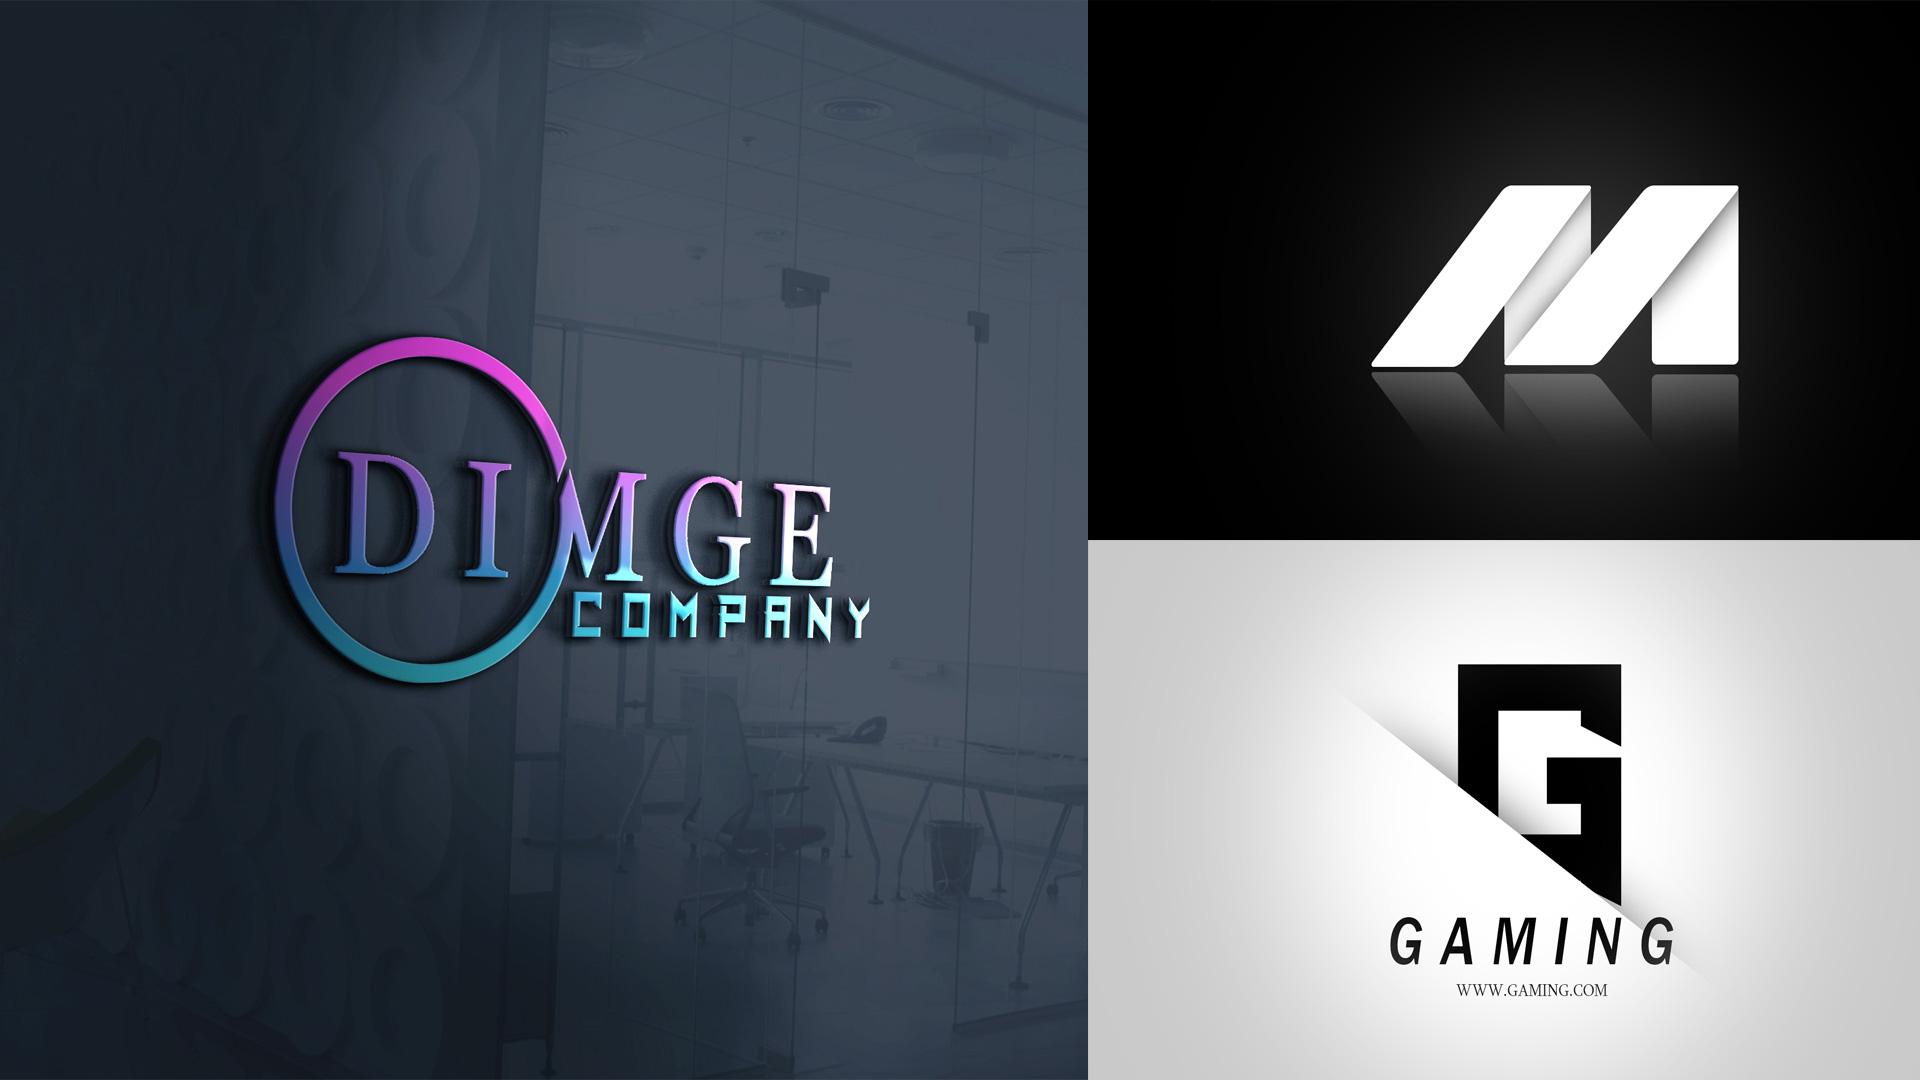 I will create modern minimalist and luxury logo